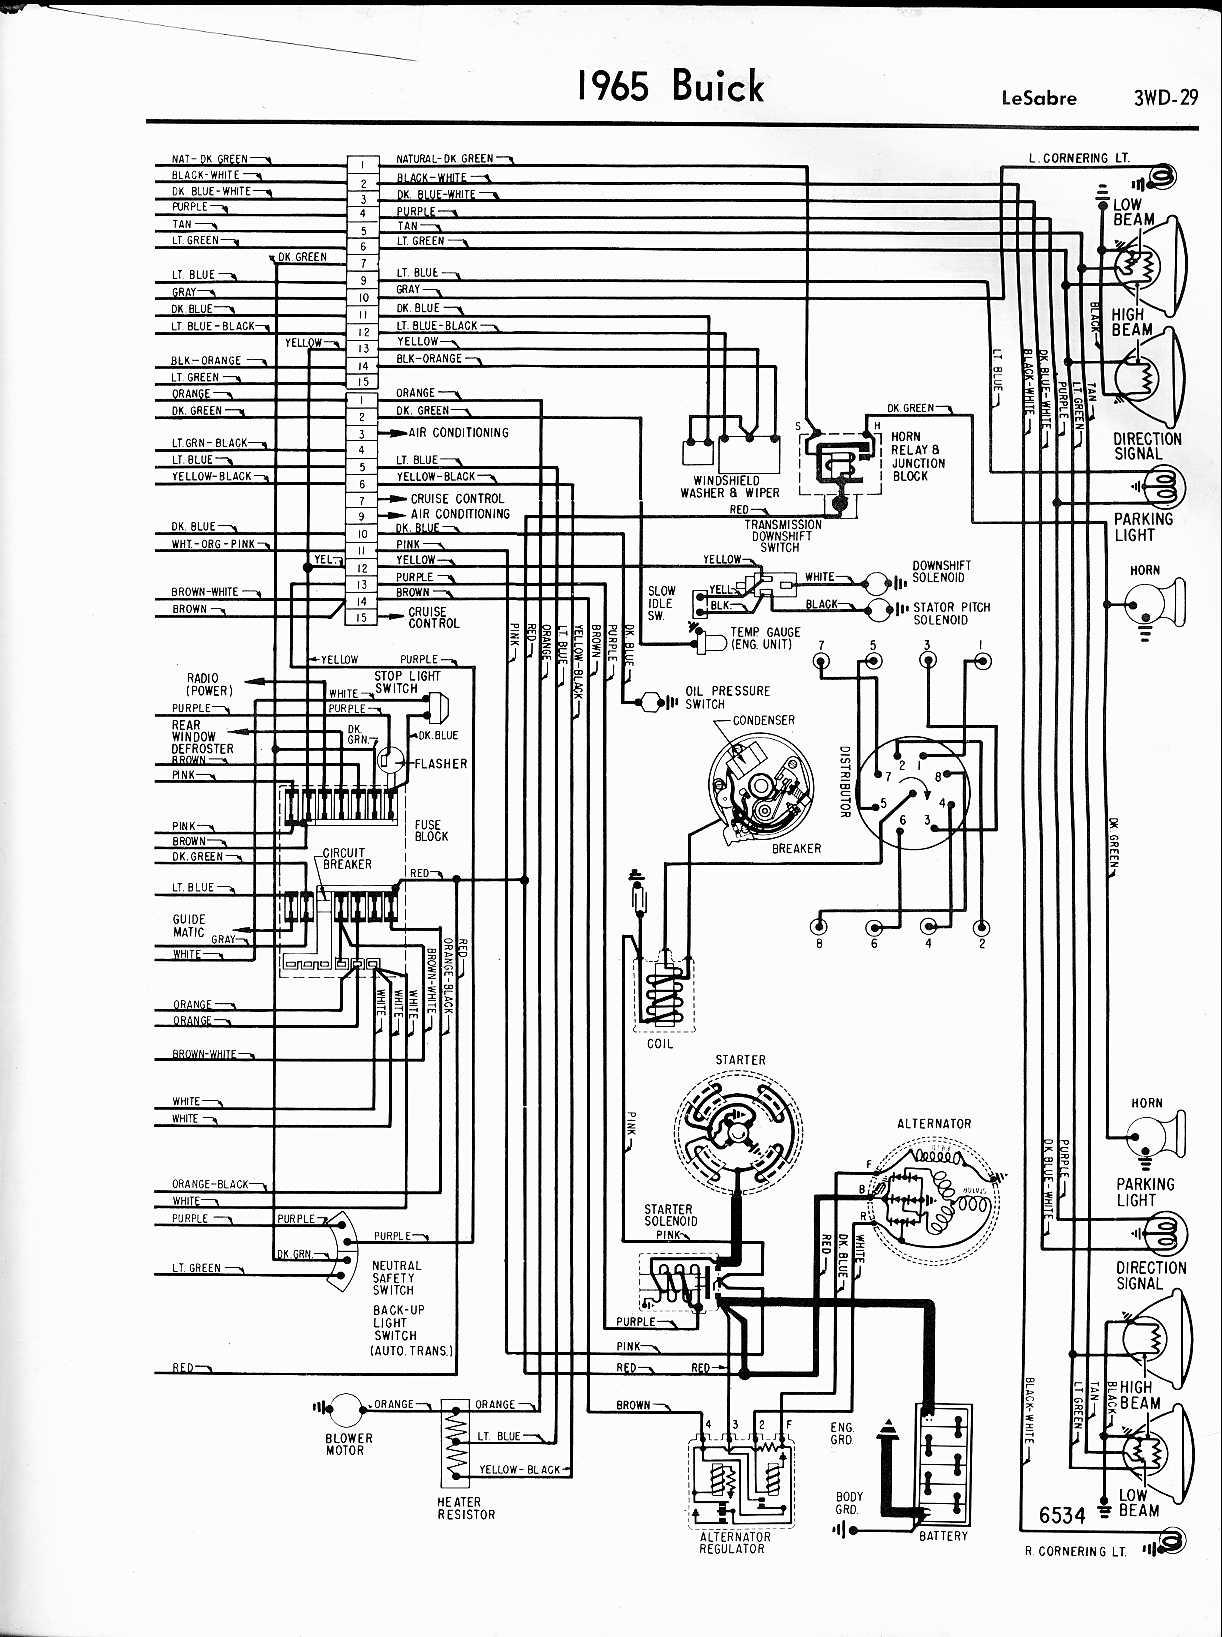 1973 buick bce series wiring diagram